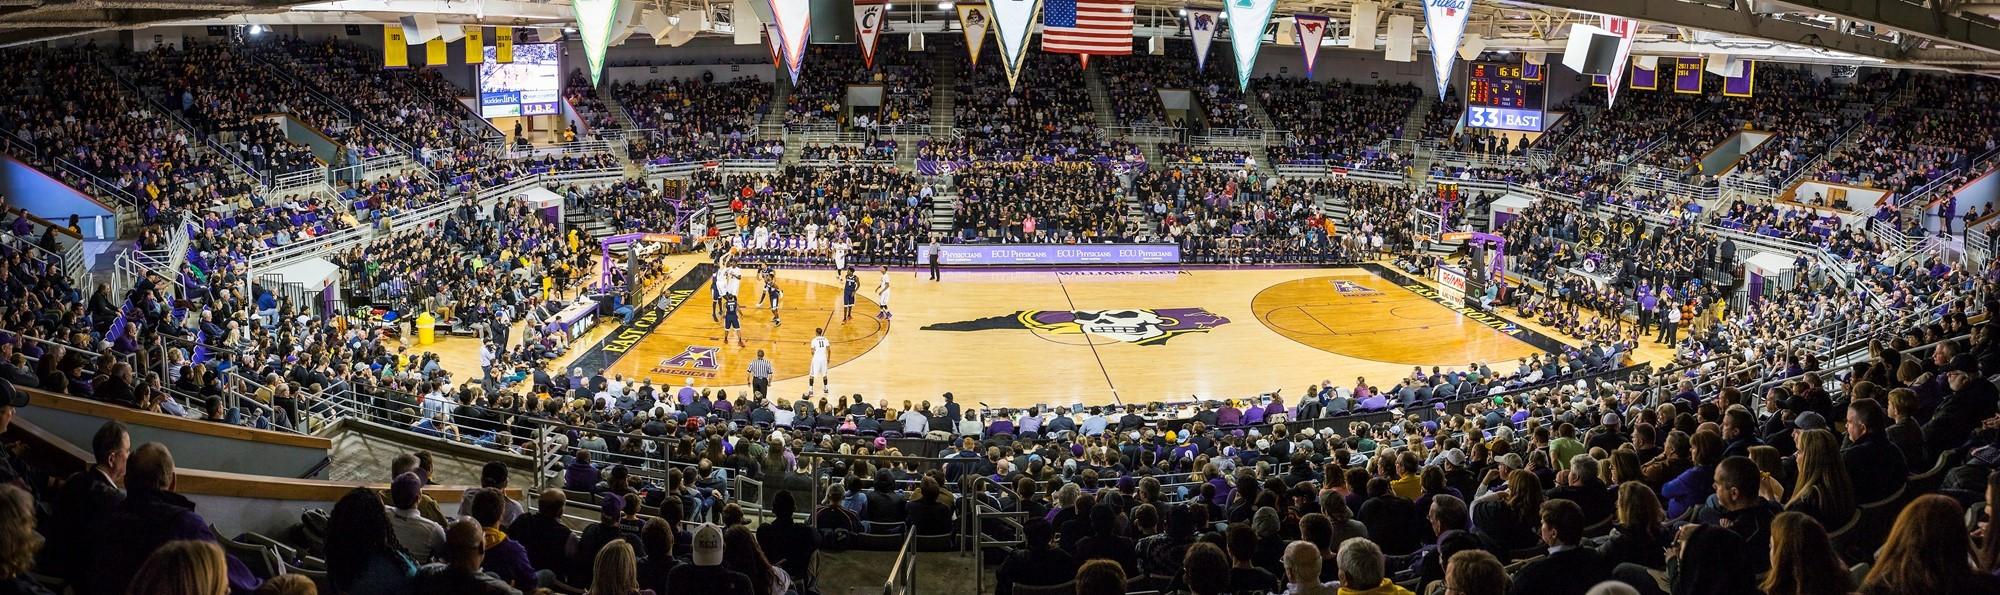 Men's Basketball - East Carolina University Athletics With East Carolina University Holiday Calendar